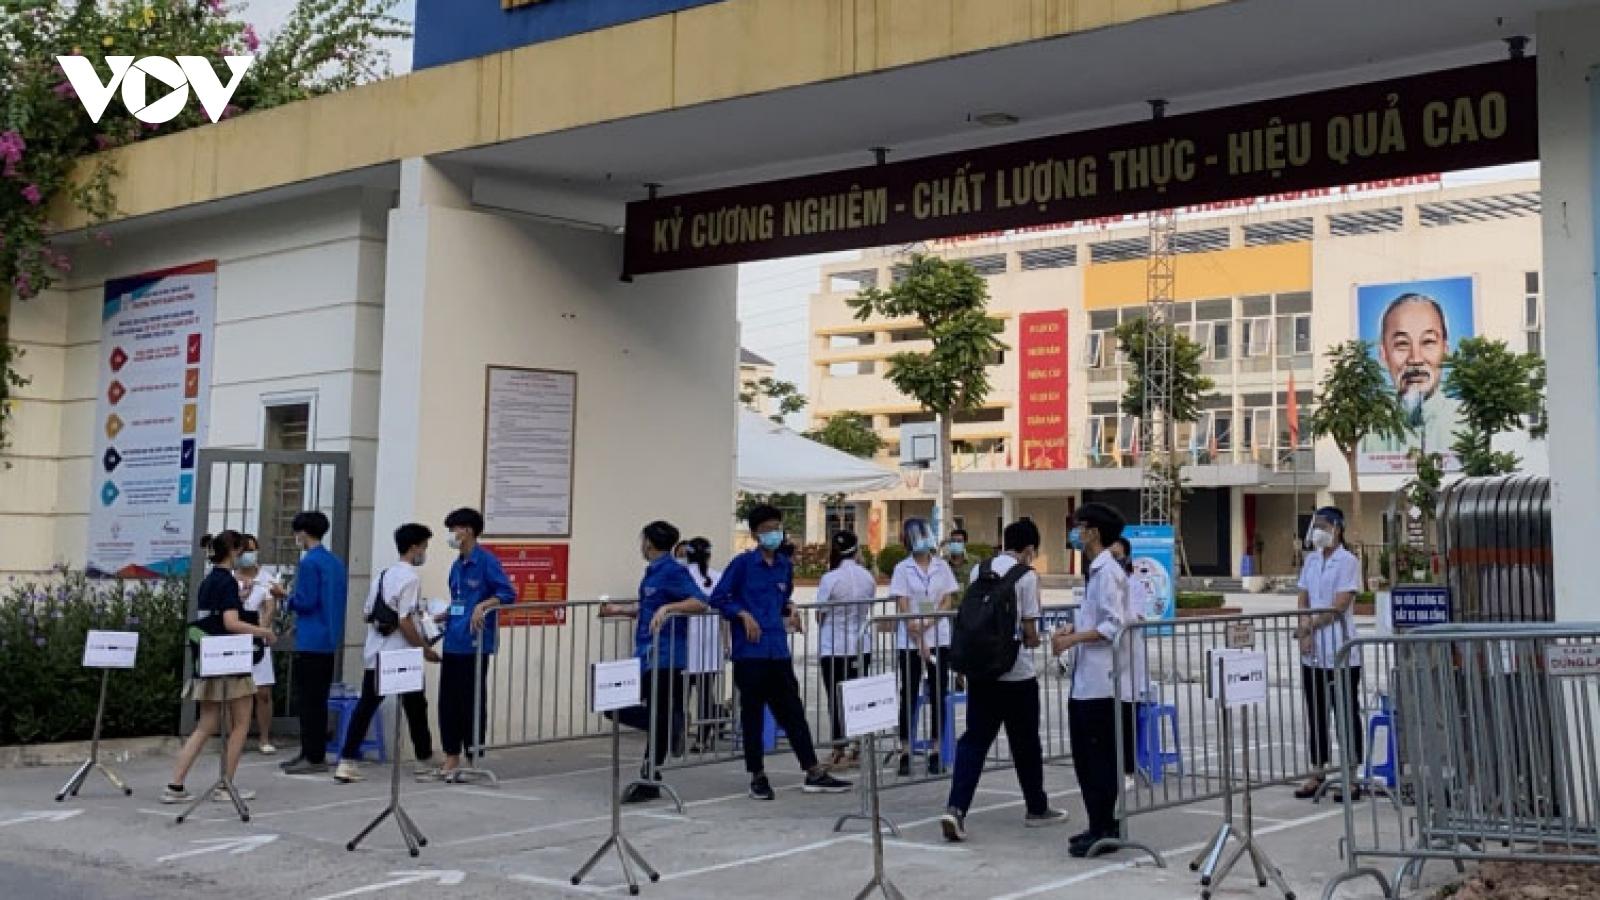 Students nationwide sit high school graduation exams